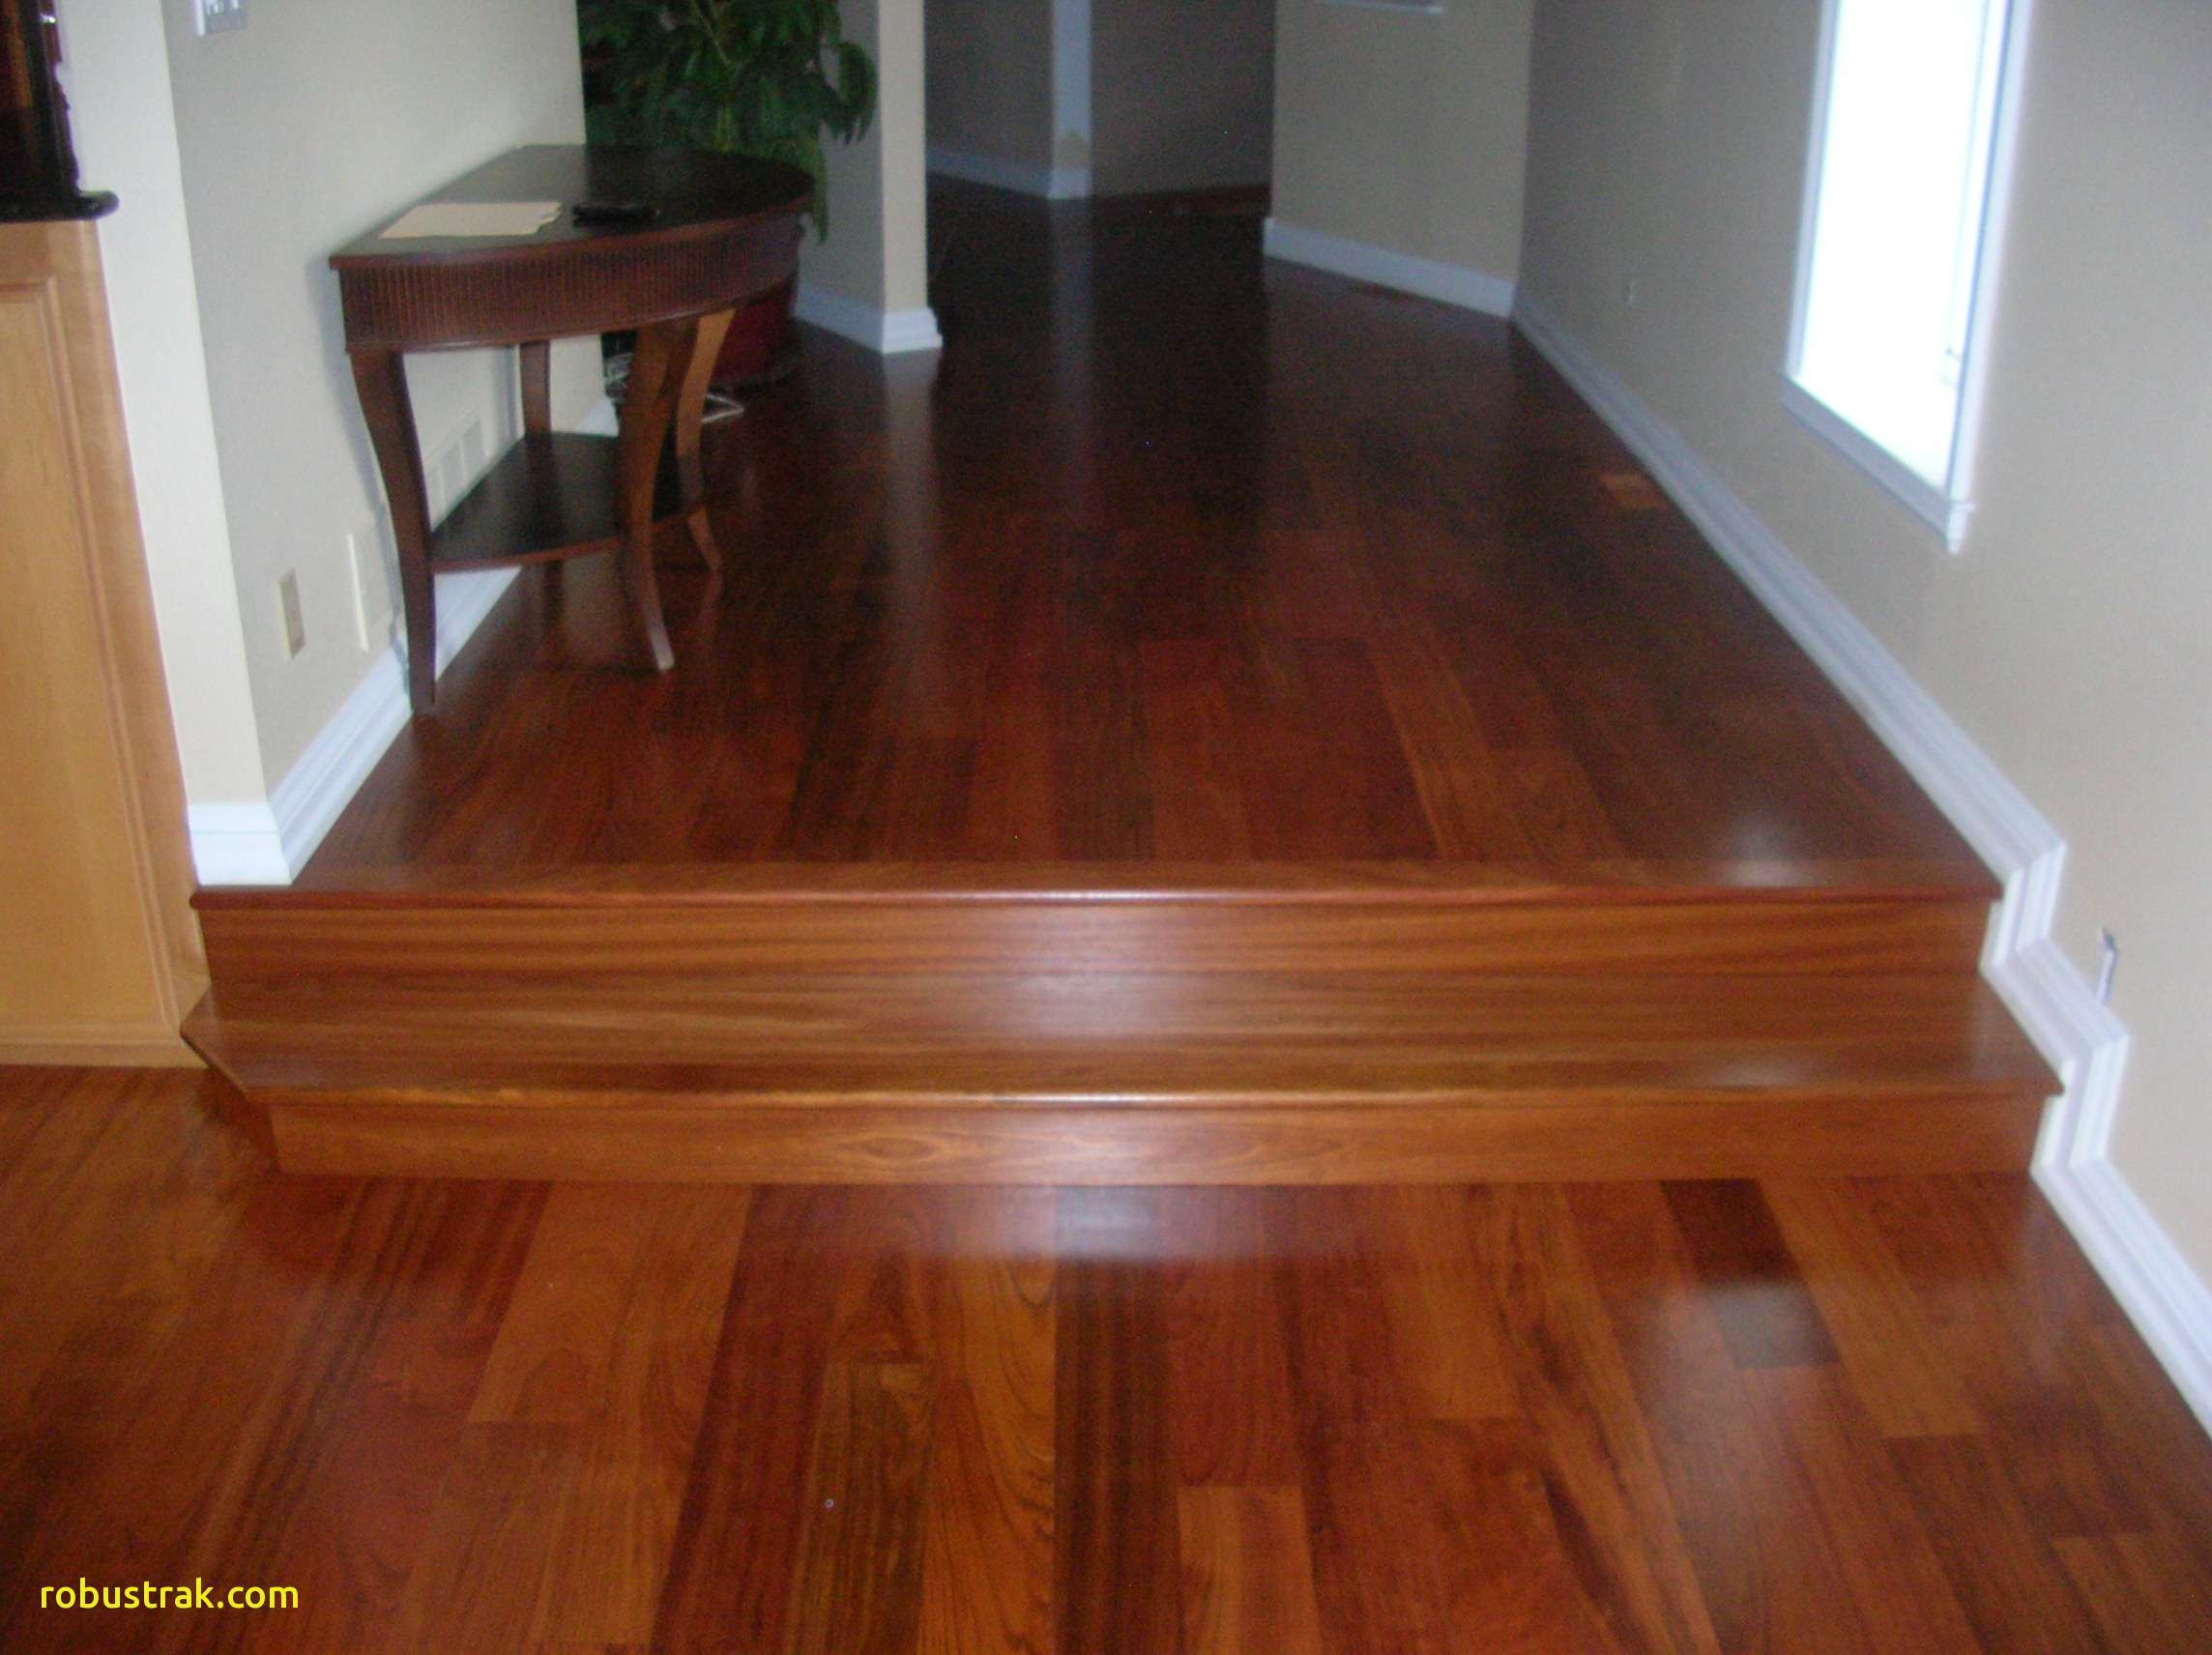 Hardwood Flooring Wiki Of Avalon Flooring Cherry Hill How to Make Wood Flooring Unique Tile Throughout Avalon Flooring Cherry Hill Carpet that Looks Like Wood